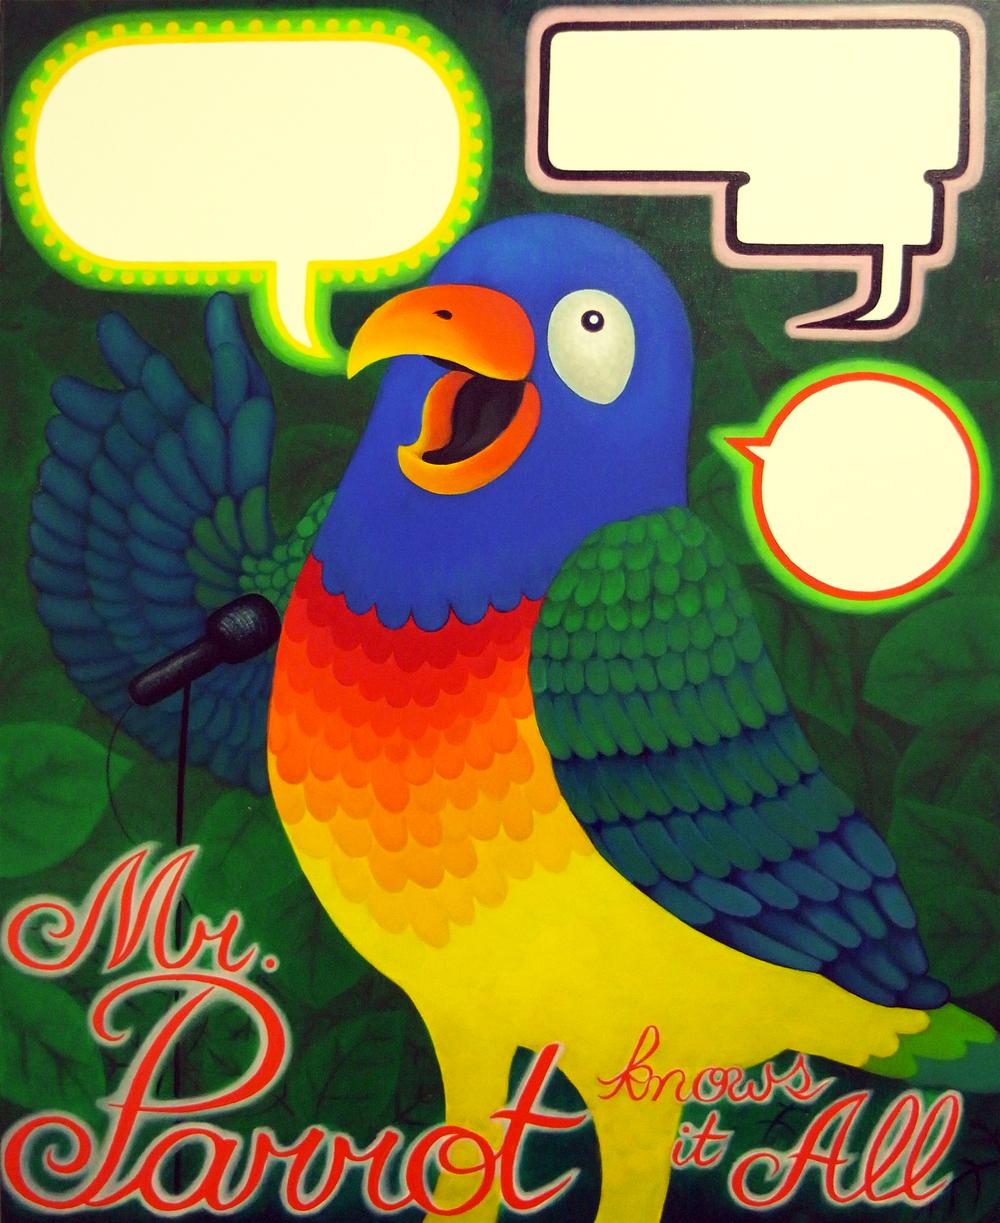 Mr. Parrot Knows it All 無所不知的鸚鵡先生